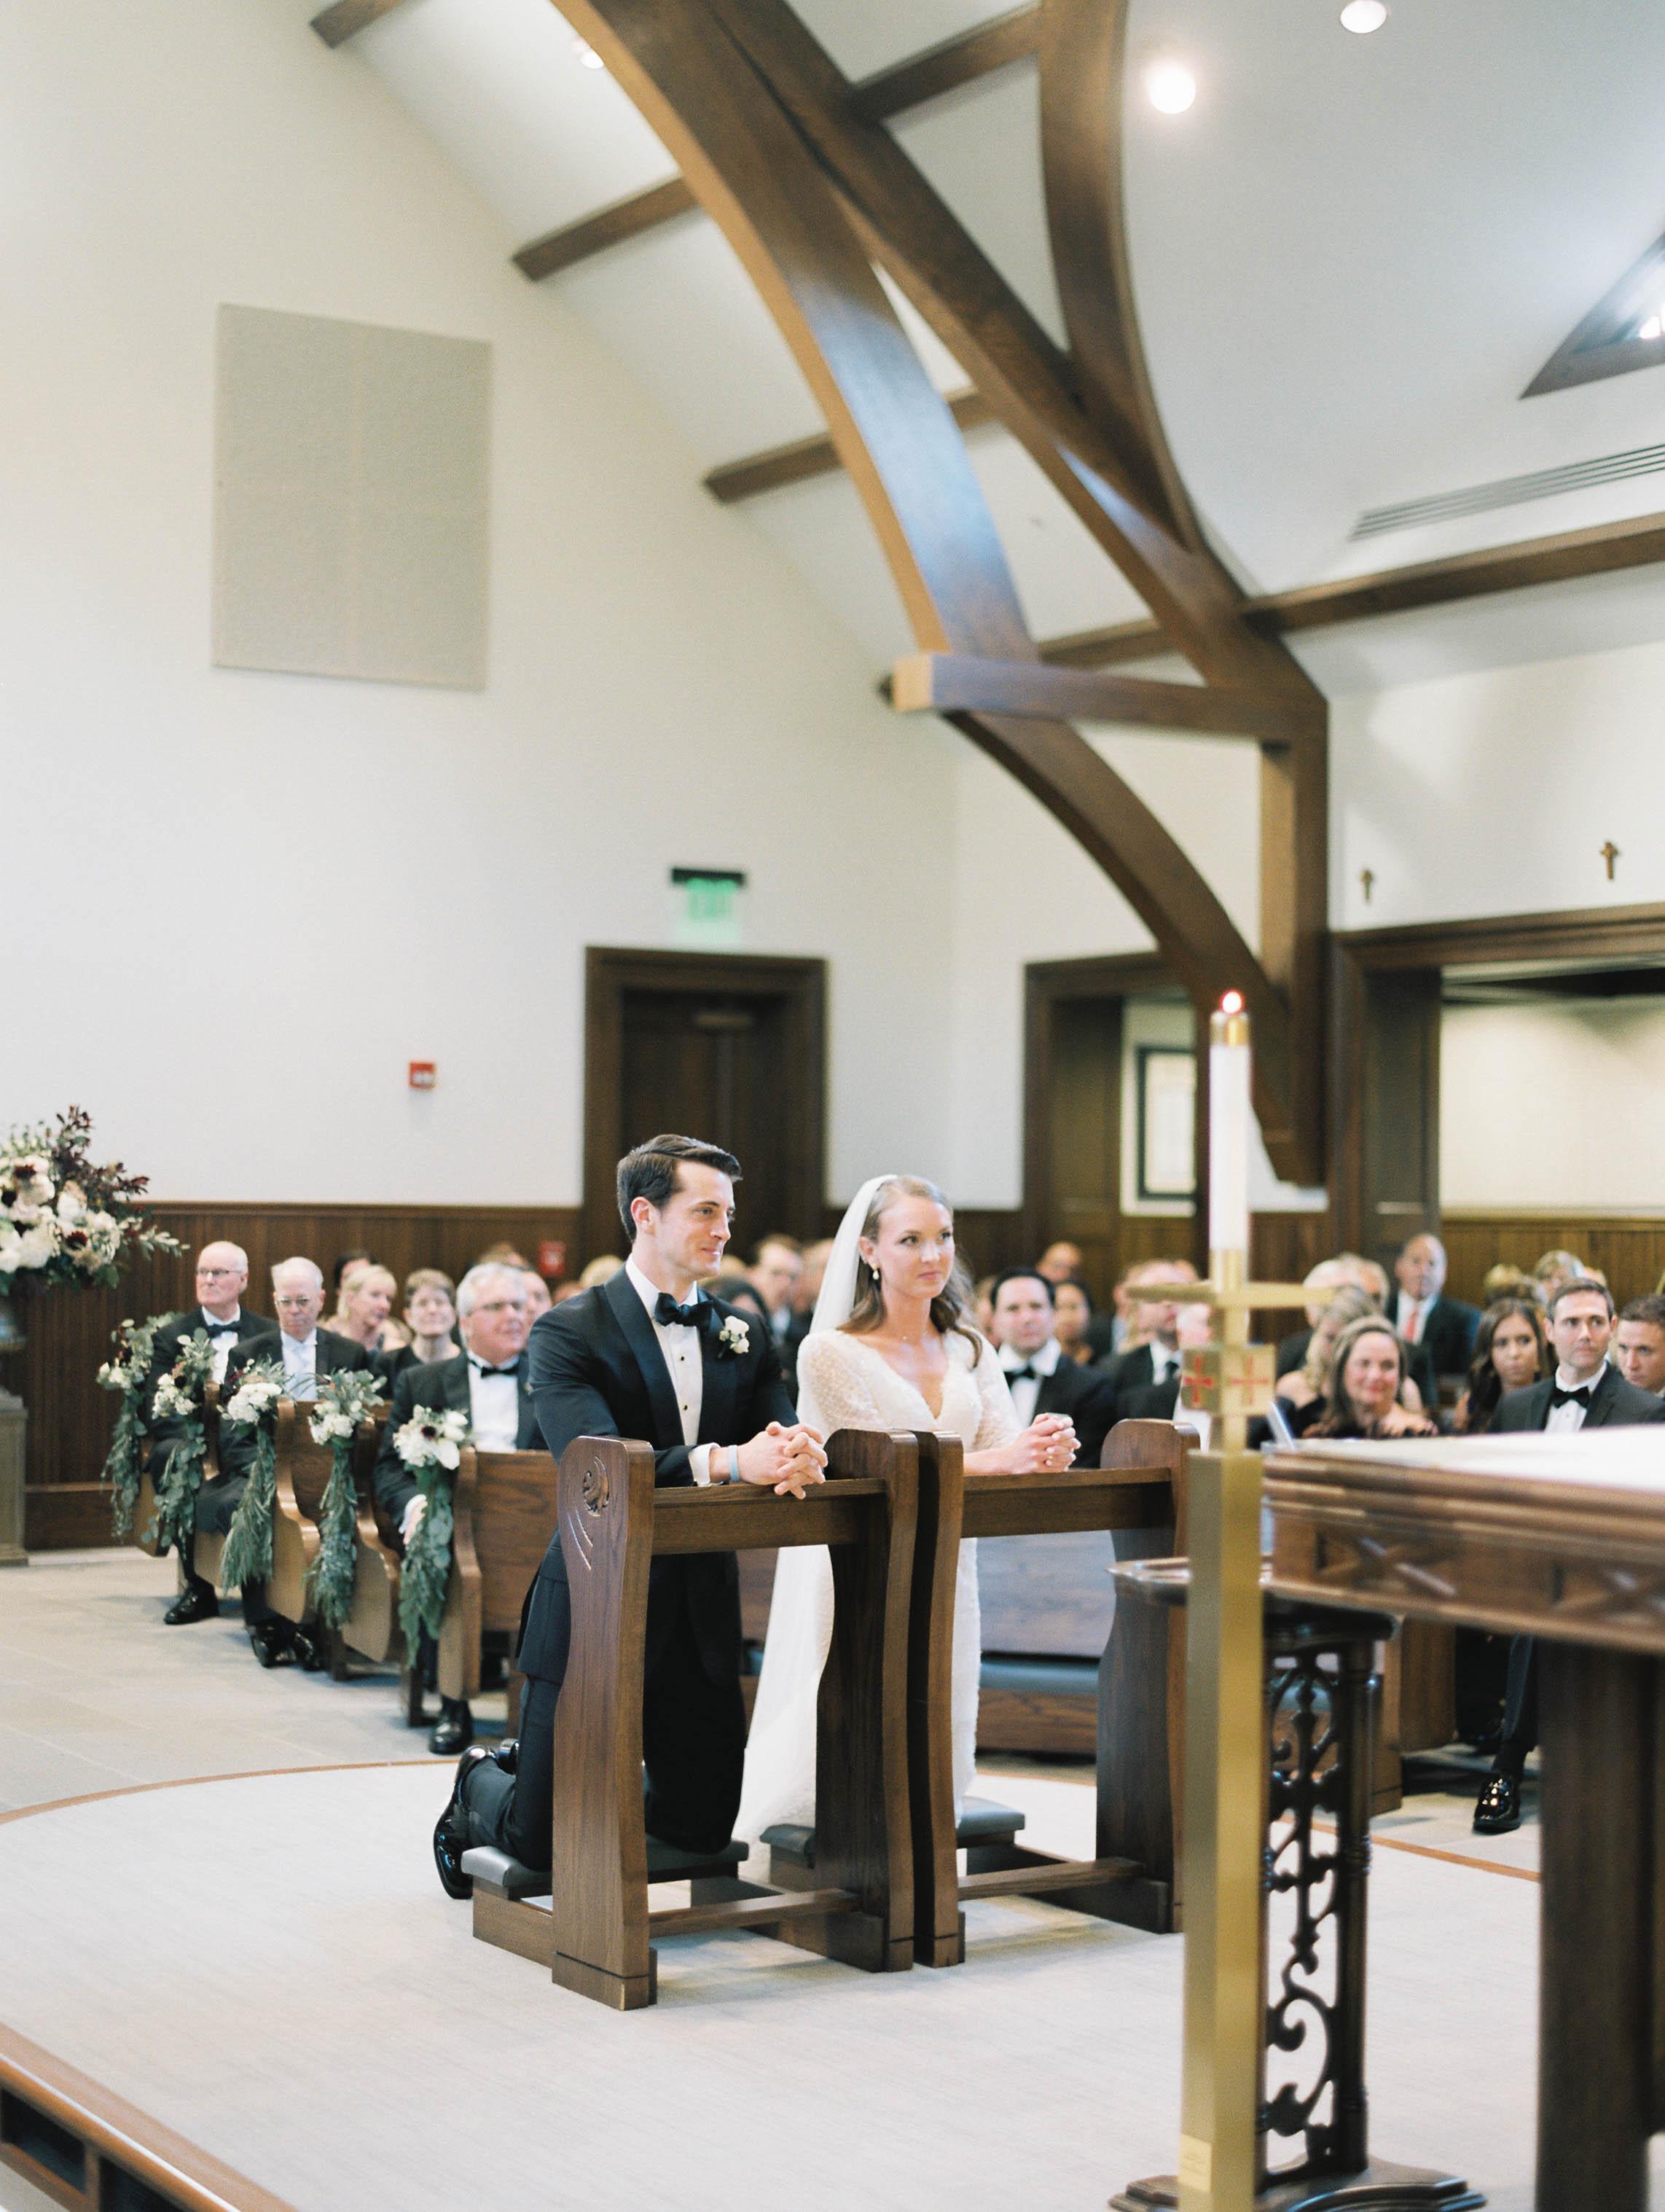 kelsandmichael_weddingphotography_rhodeislandwedding-29.jpg